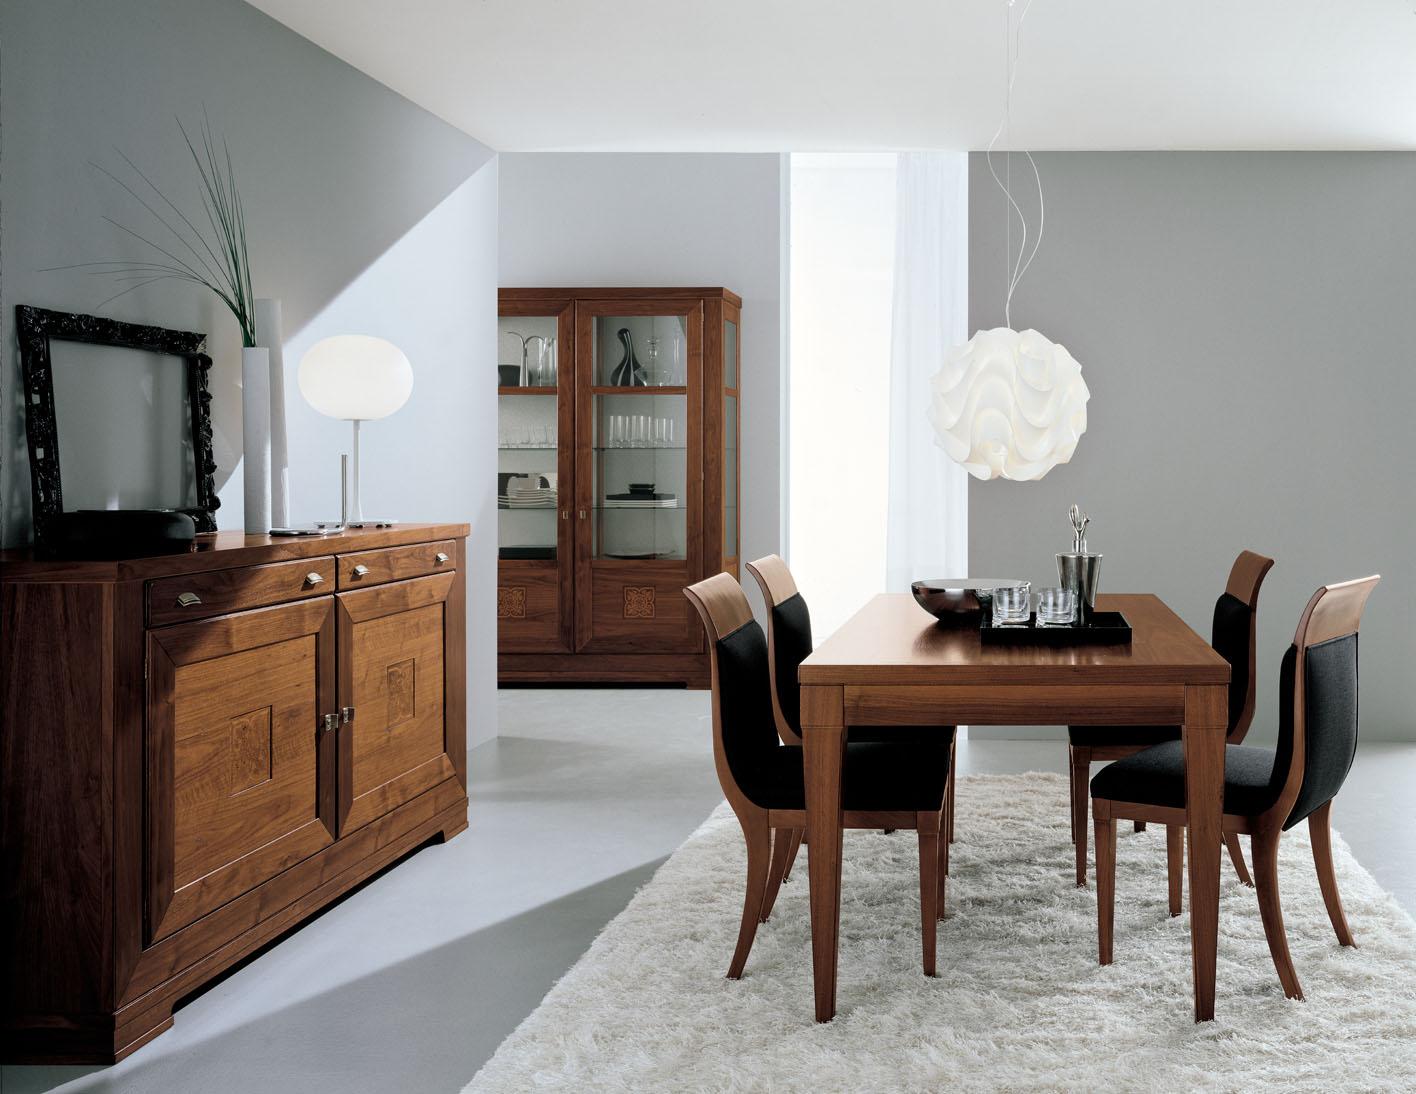 house 6 by marcio kogan. Black Bedroom Furniture Sets. Home Design Ideas